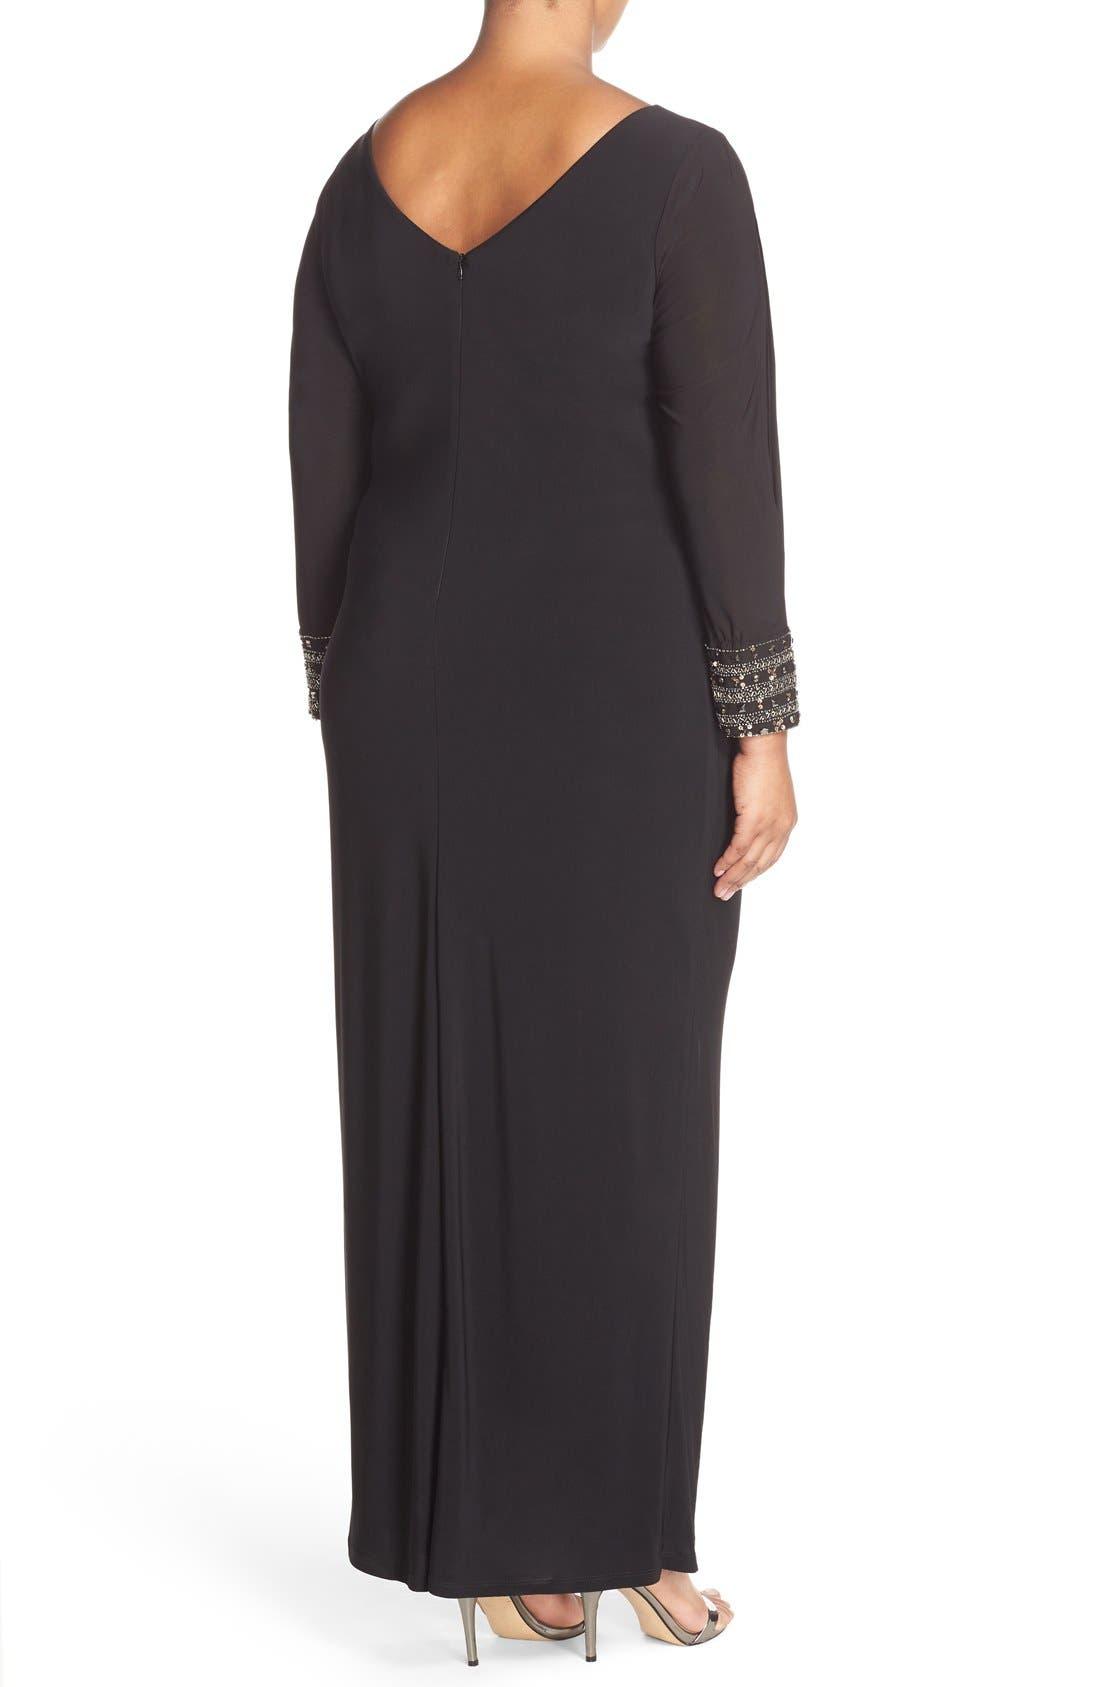 Embellished Stretch Jersey Long Dress,                             Alternate thumbnail 2, color,                             BLACK/ GOLD